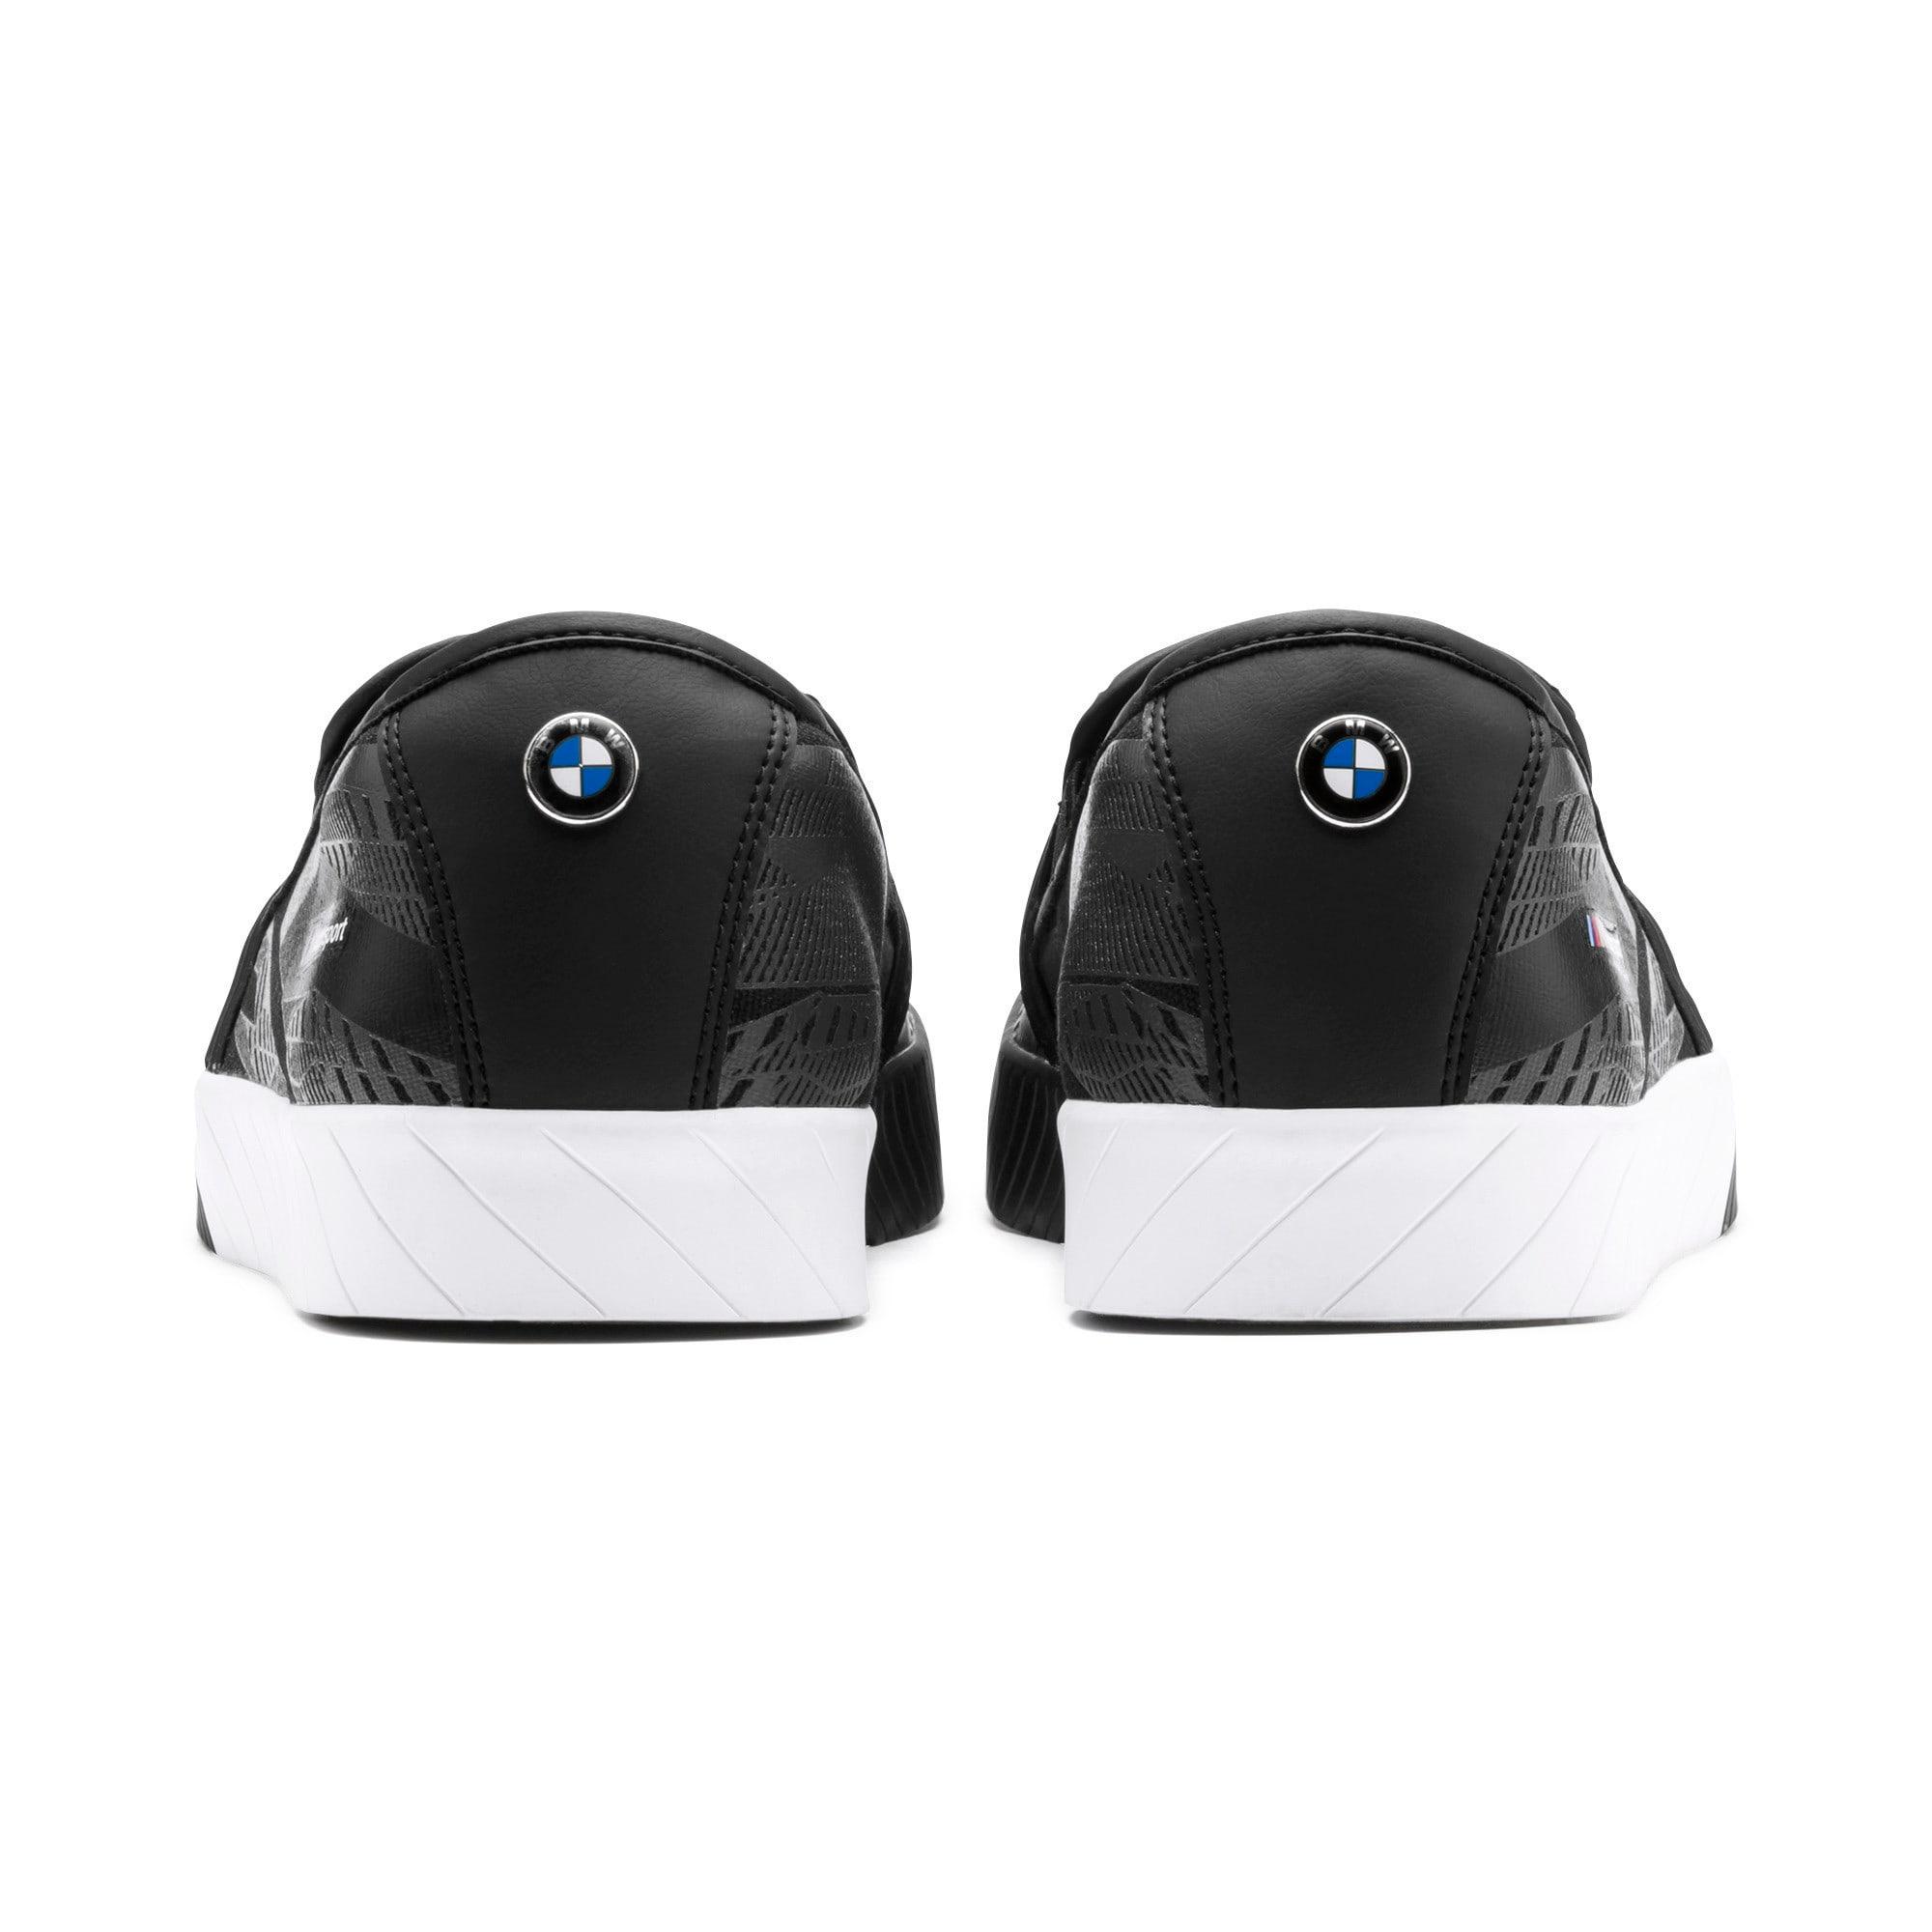 Thumbnail 5 of BMW M Slip-On Track Shoes, Puma Black-Puma Black, medium-IND